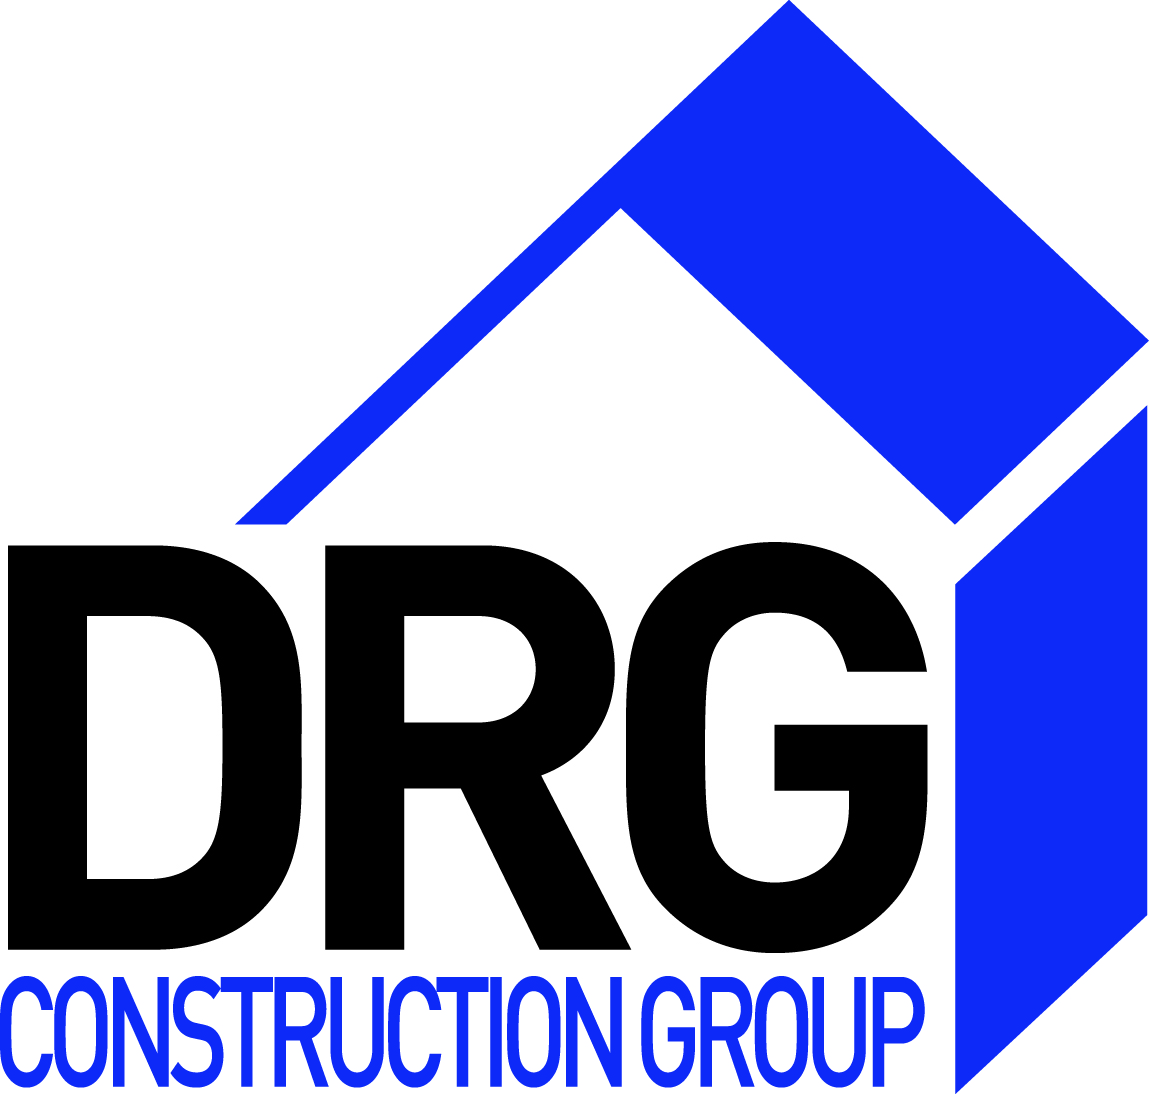 ID_DRGConstructionGroup_PR.jpg